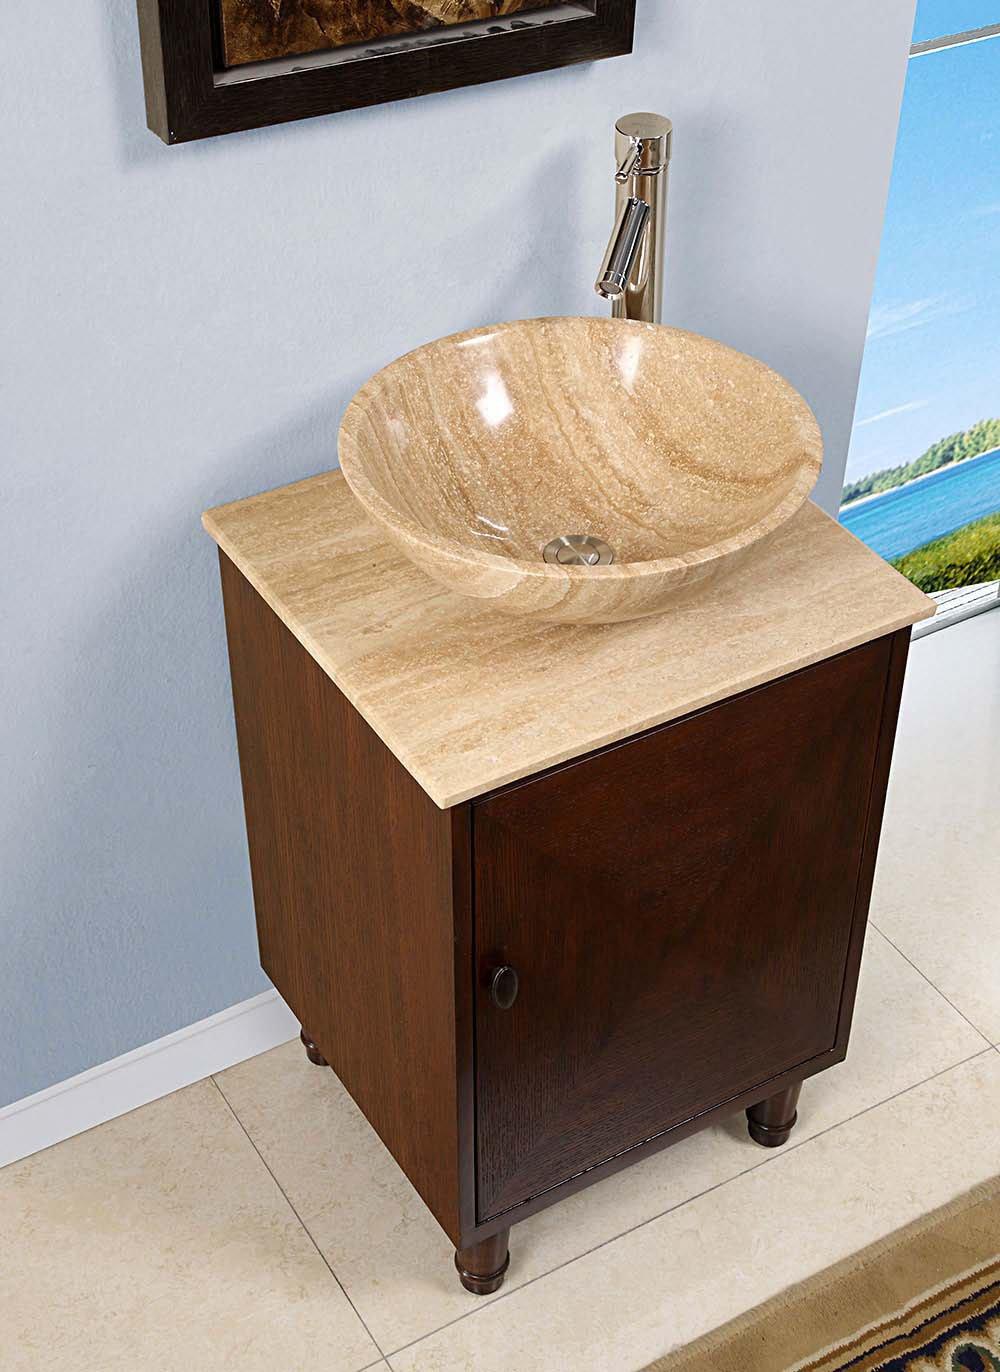 Silkroad 20 Inch Travertine Vessel Sink Vanity English Chestnut